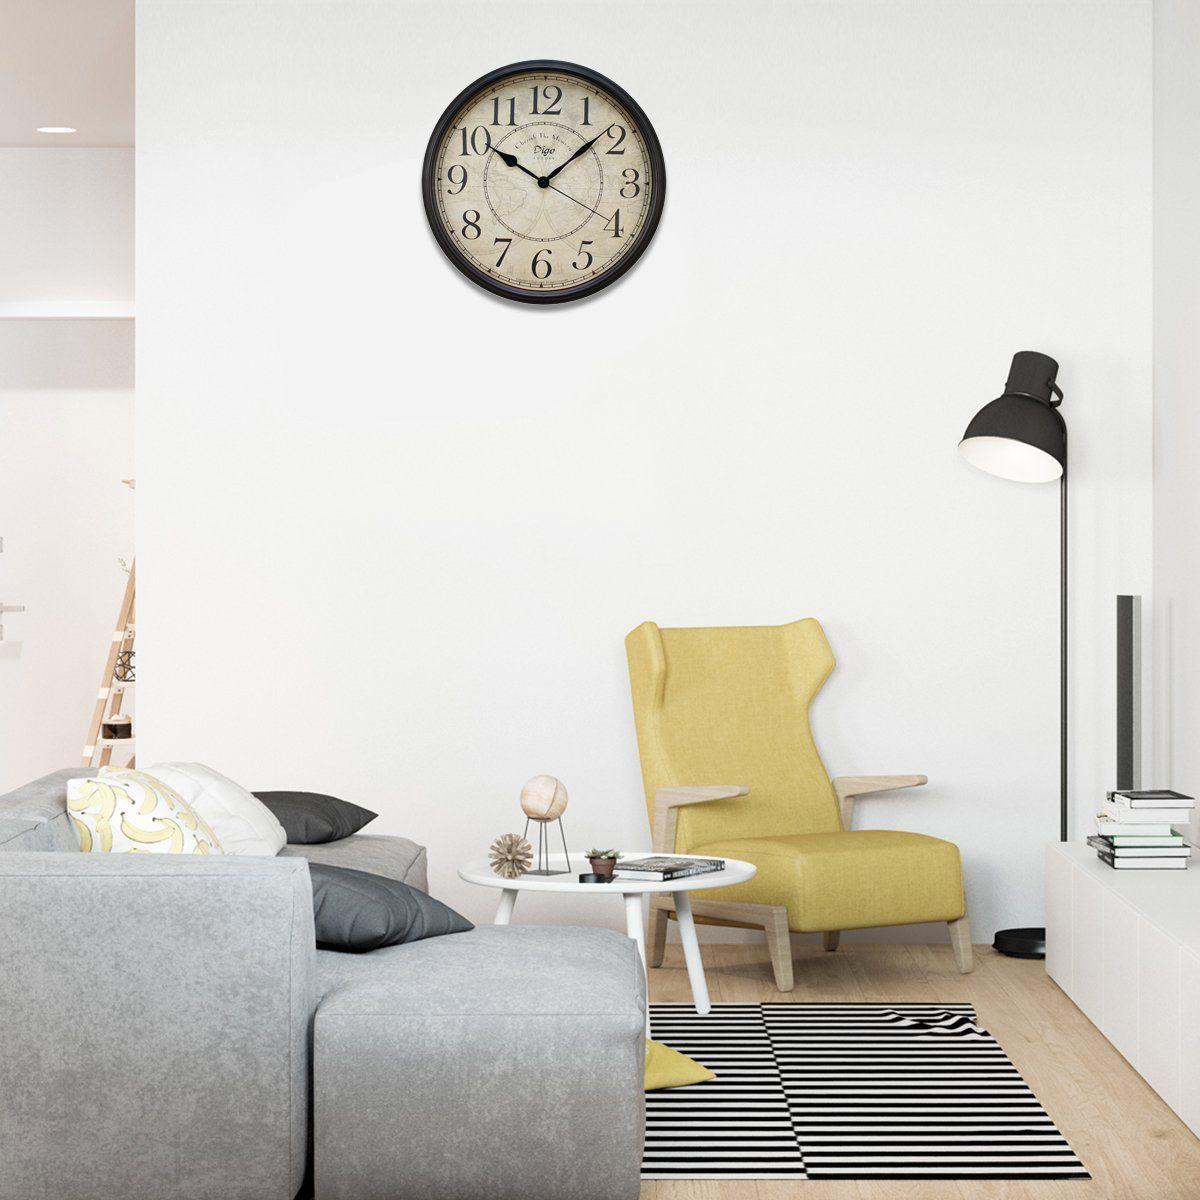 Hippih 12 Silent Wall Clock Wood Non Ticking Digital Quiet Sweep Home Decor Vintage Wooden Clocks Number Wood Wall Clock Outdoor Wall Clocks Wall Clock